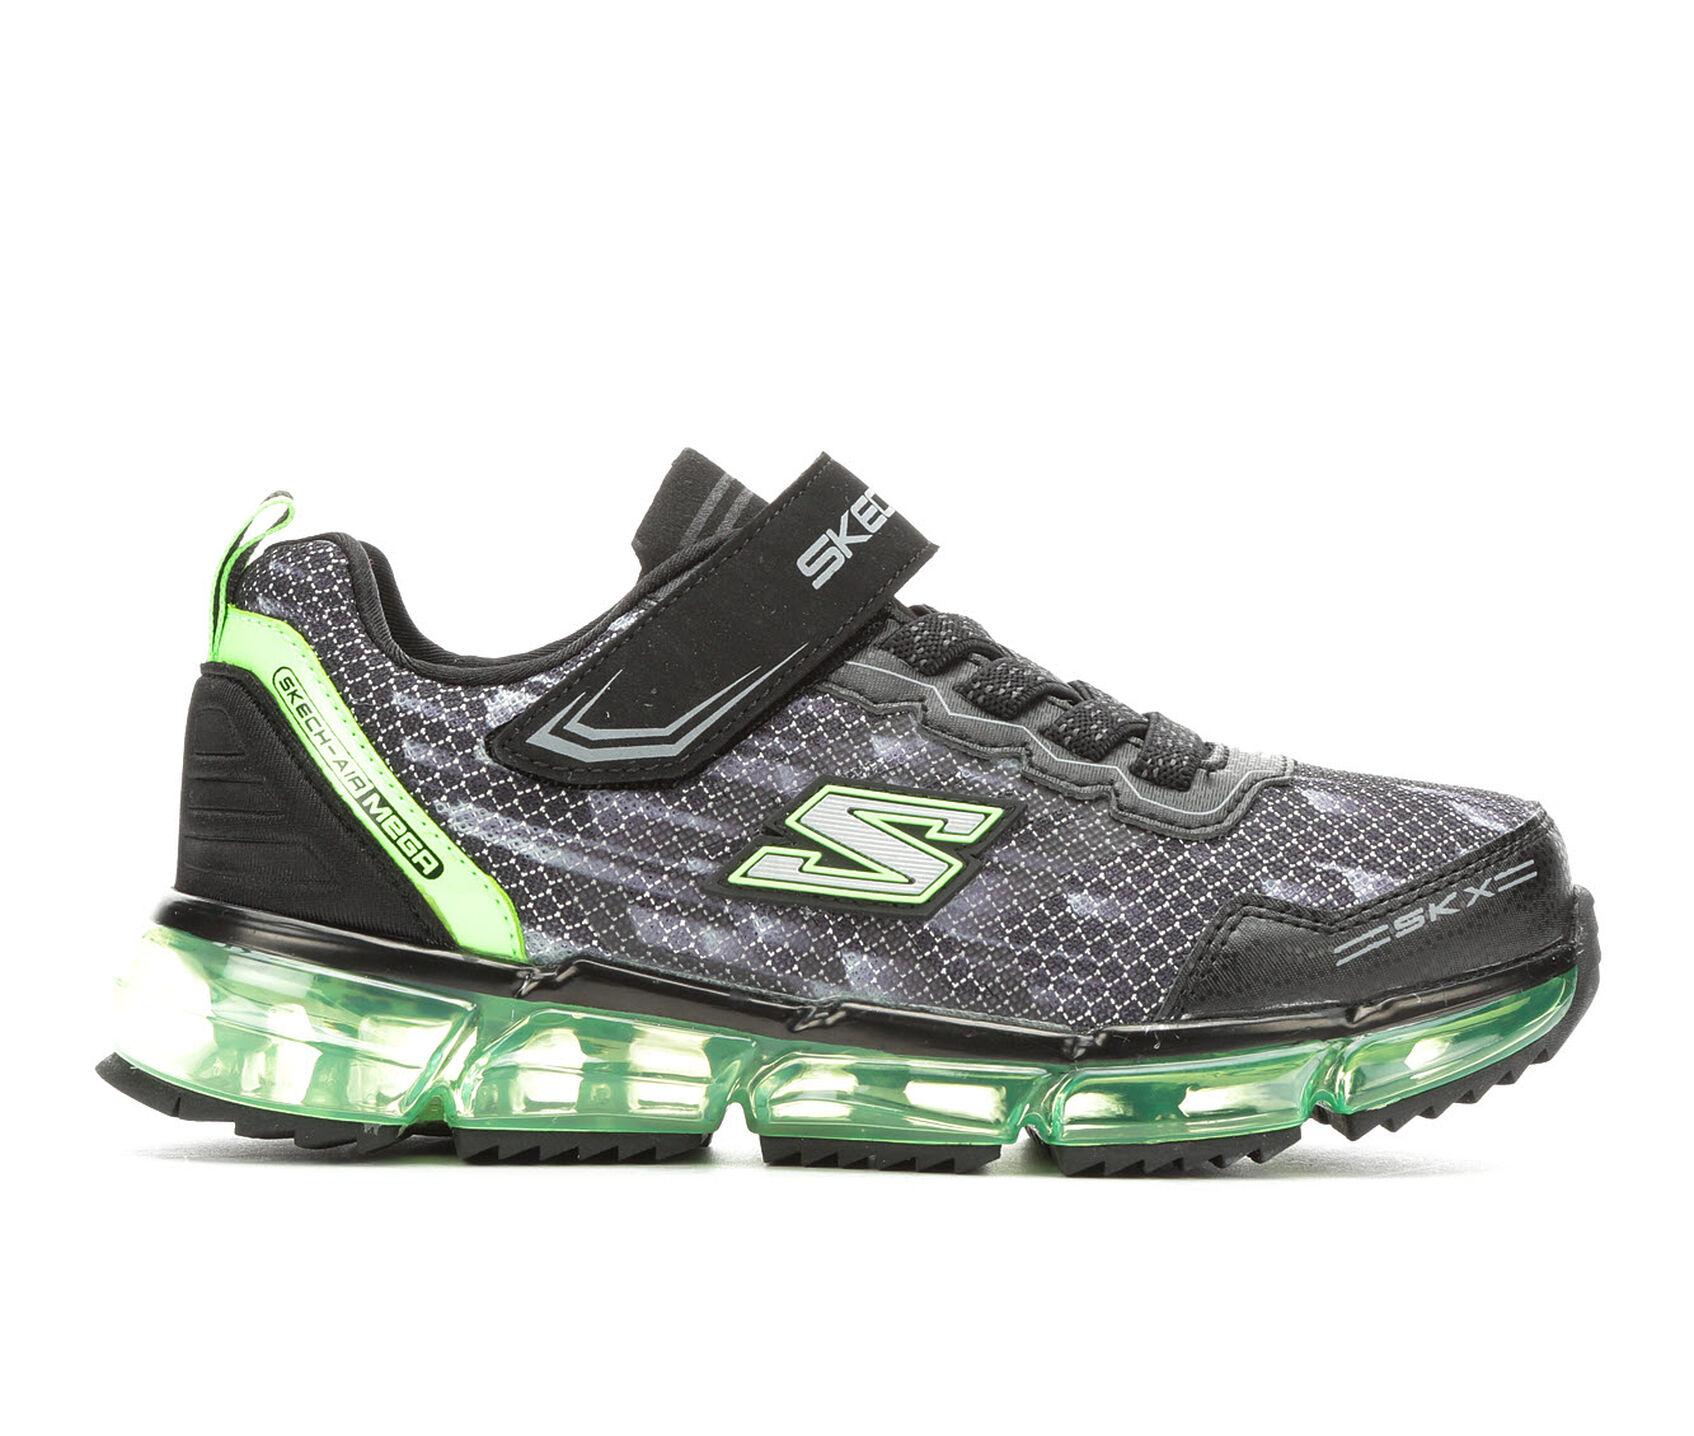 skechers skech air mega boys' sneakers